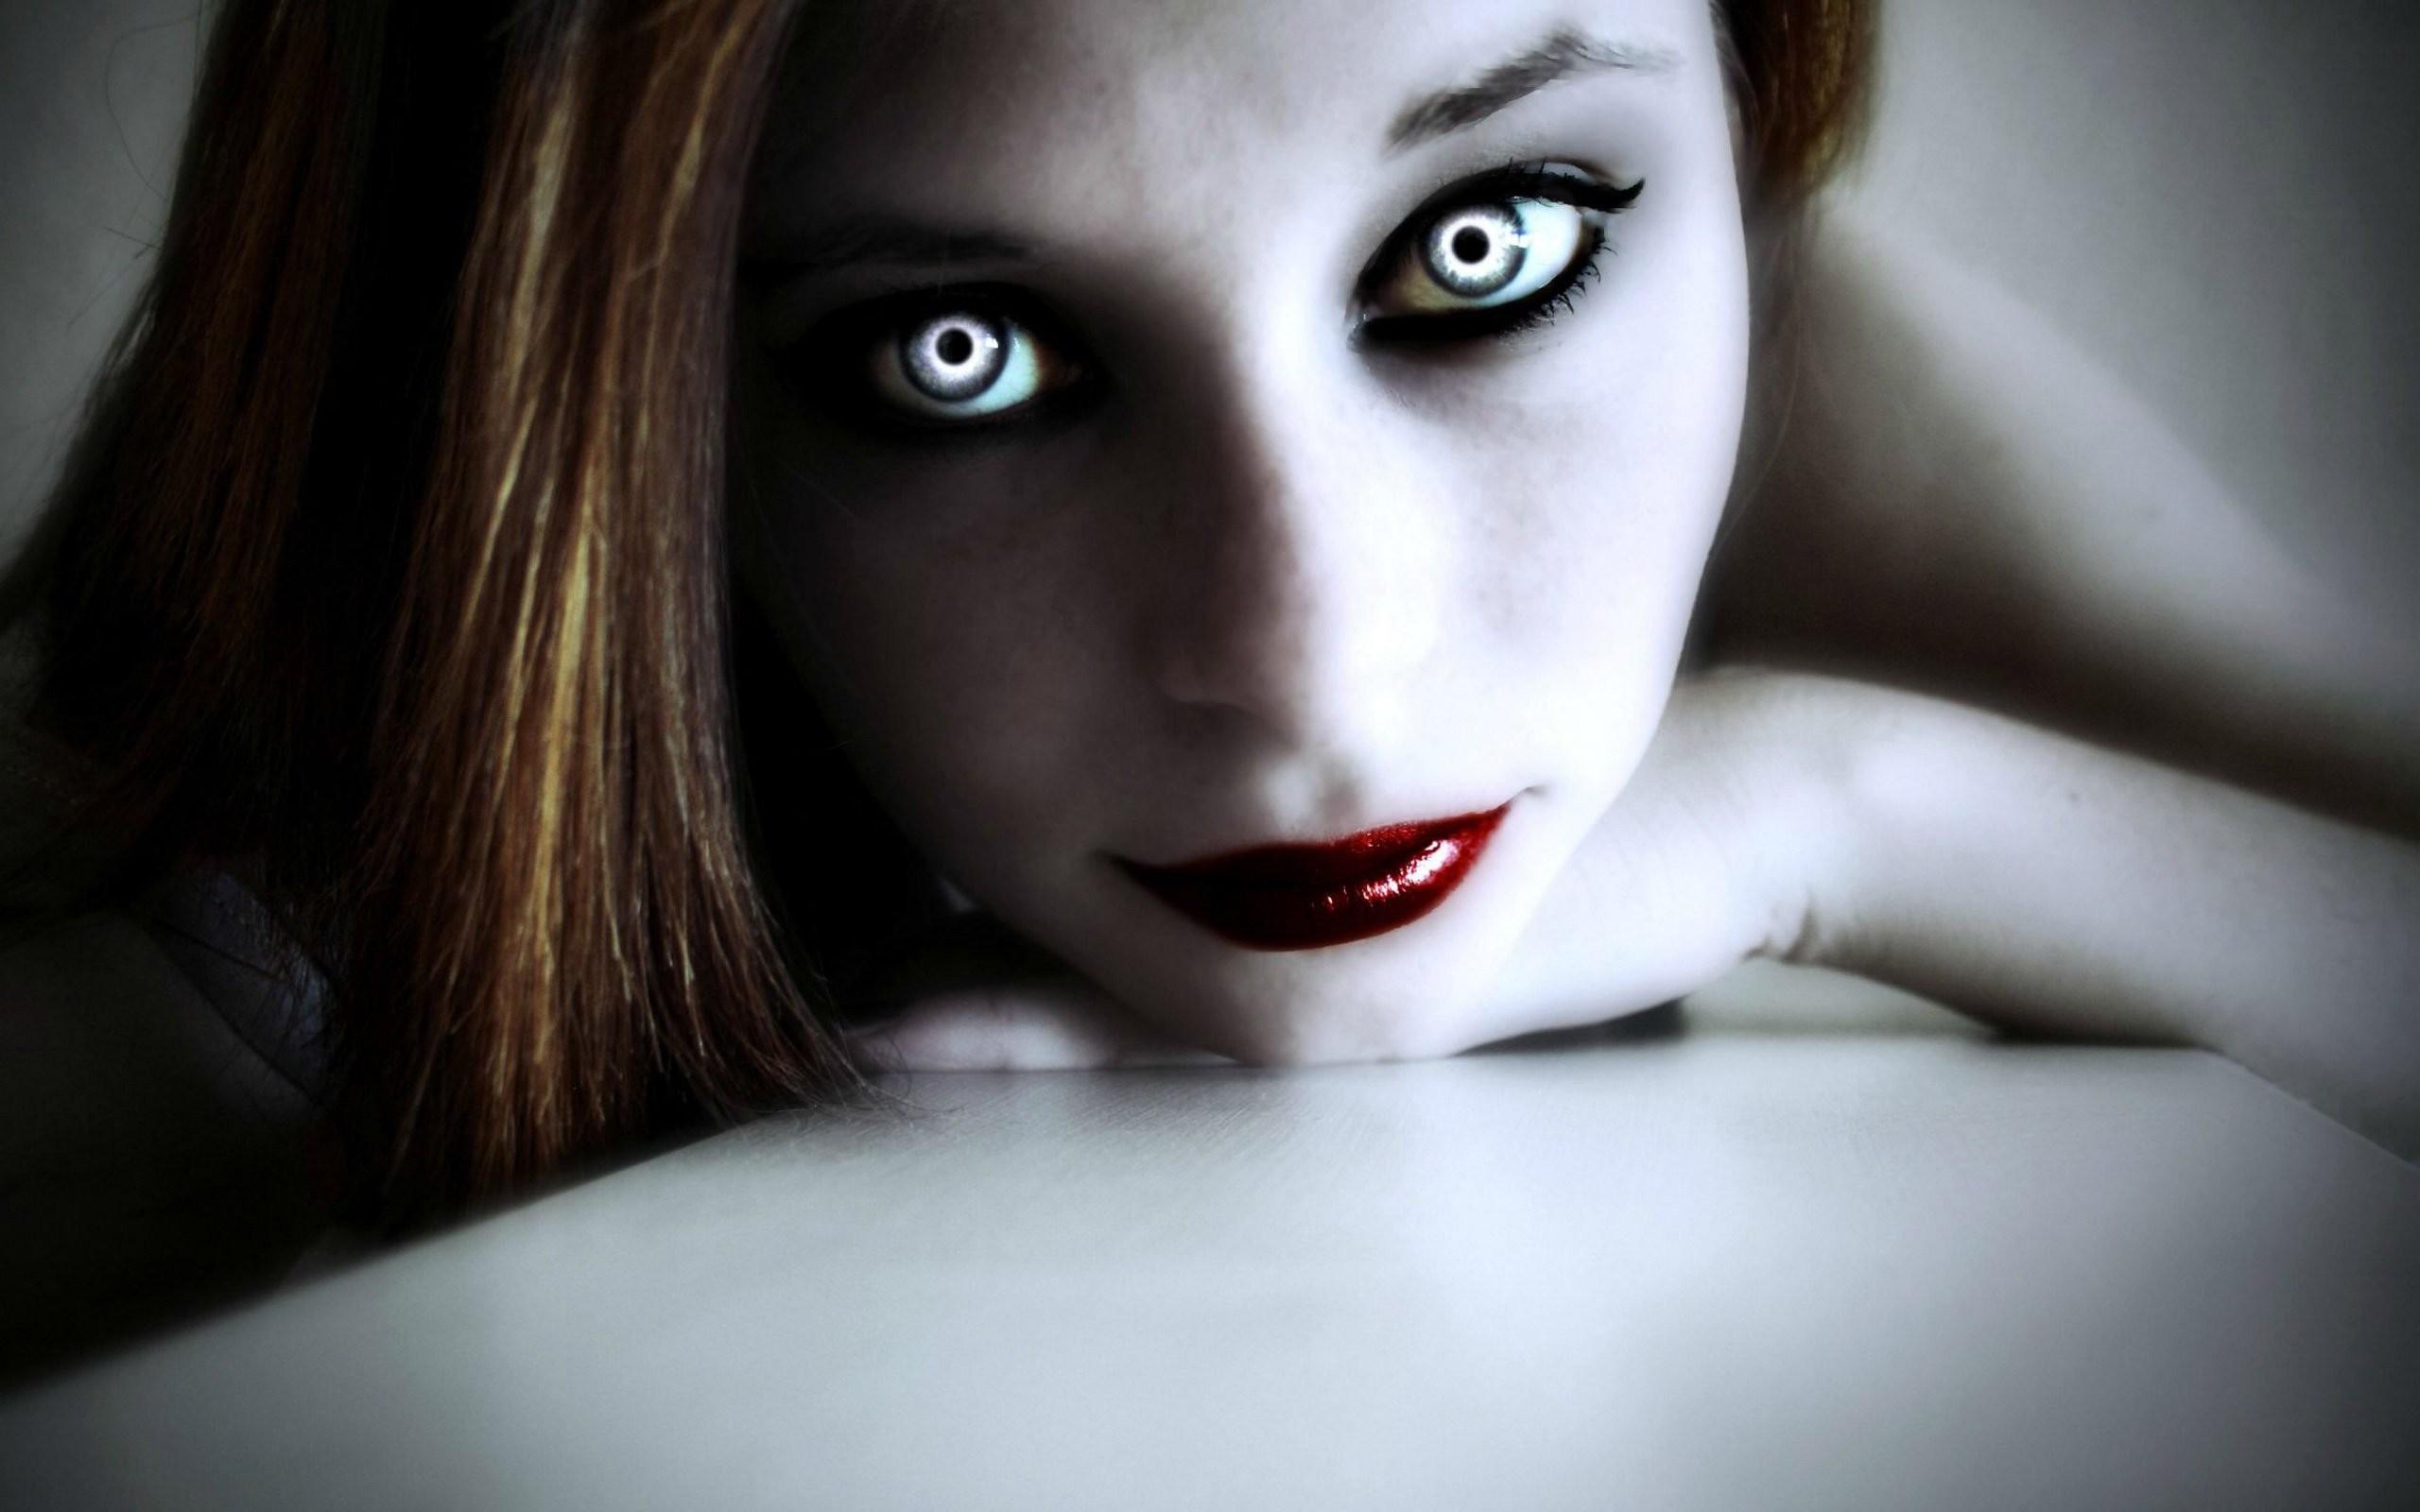 Filename: 4508-vampire-woman.jpg